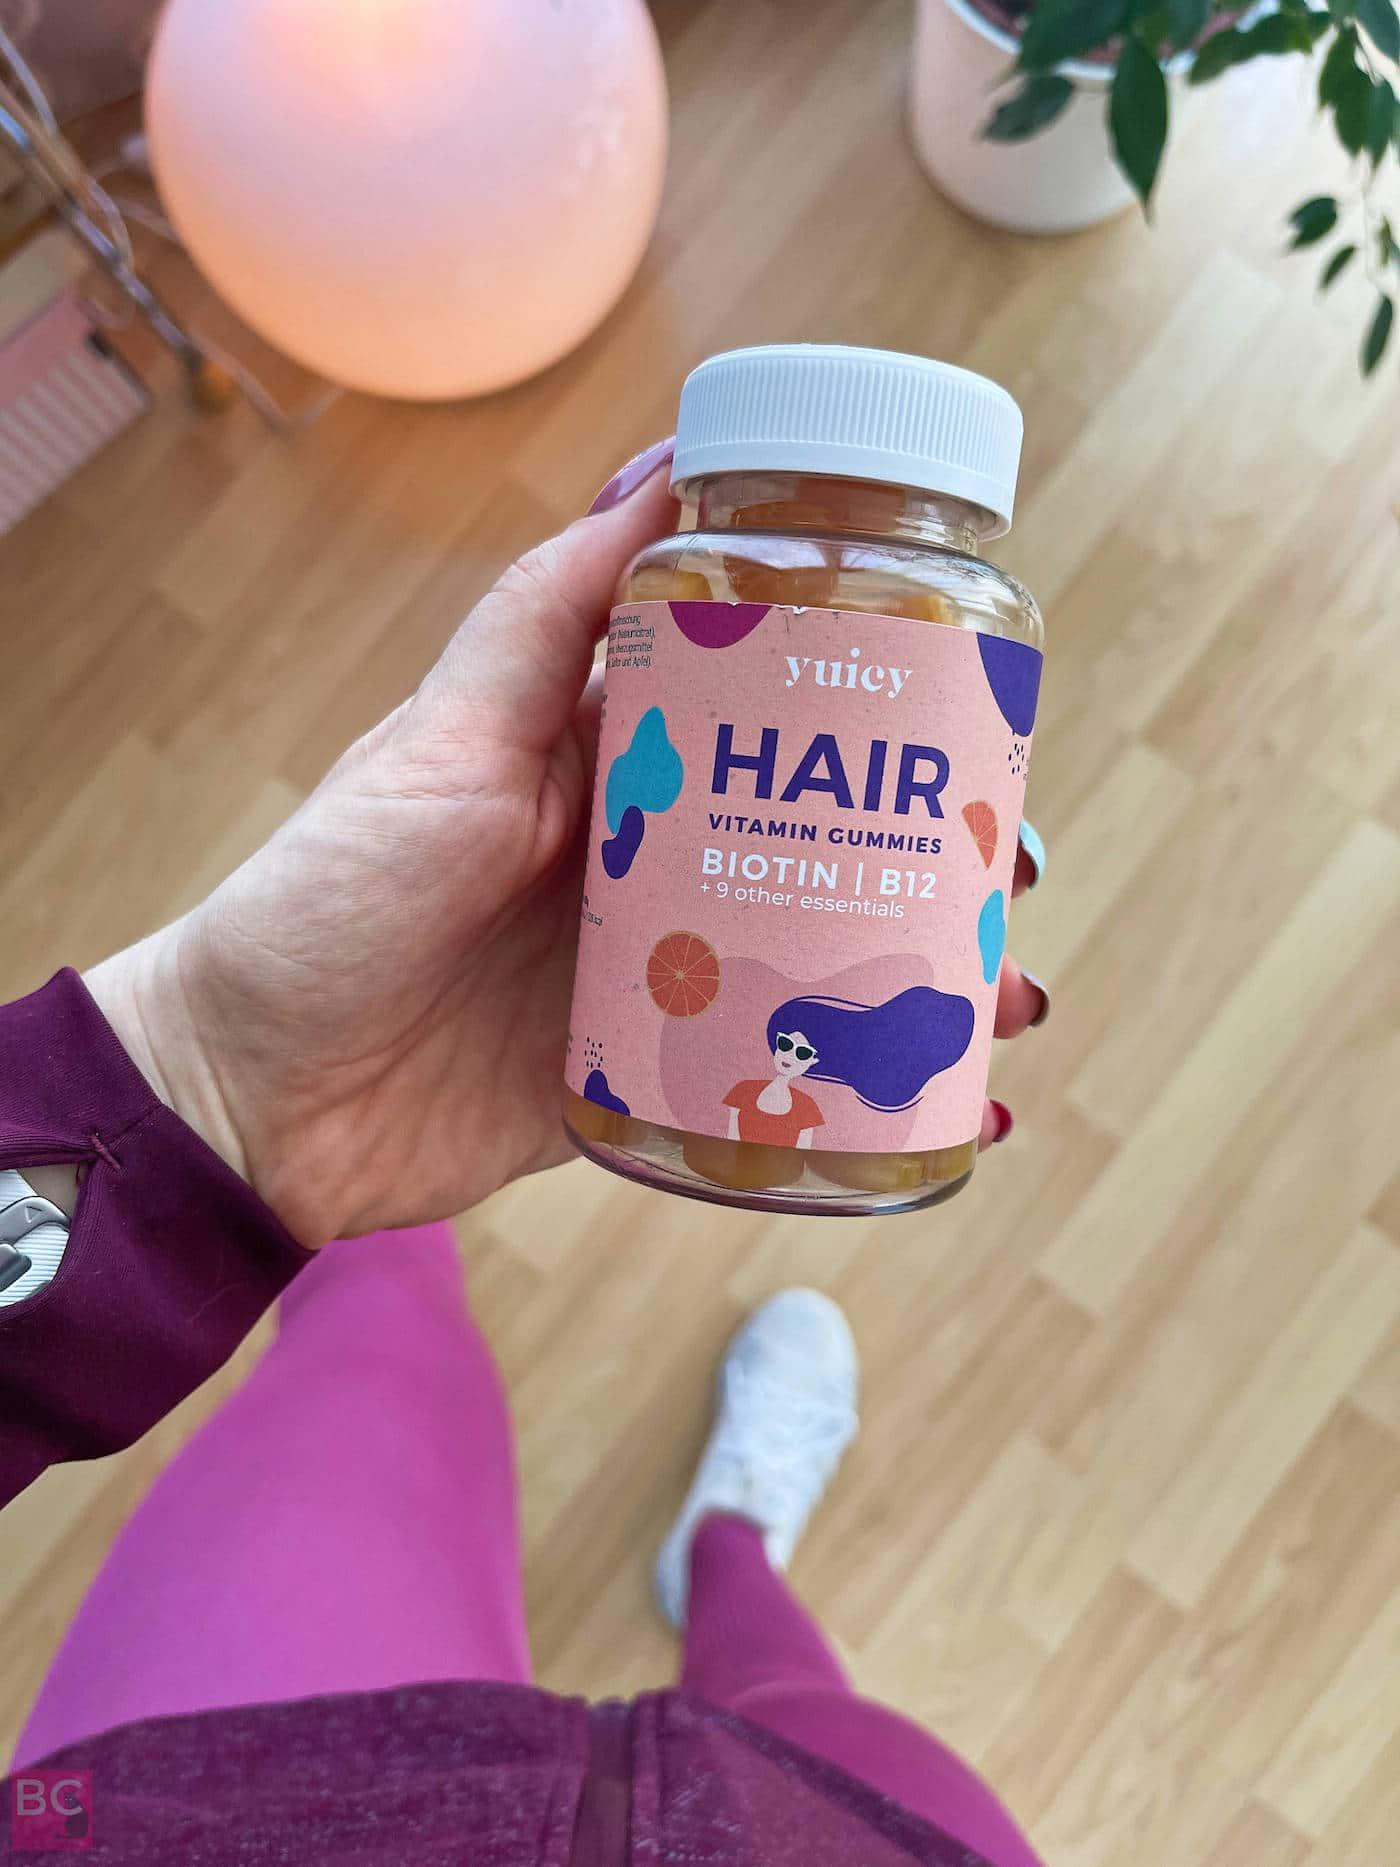 HAIR YUICY Erfahrungen Vitamin Gummies Bewertung Biotin B12